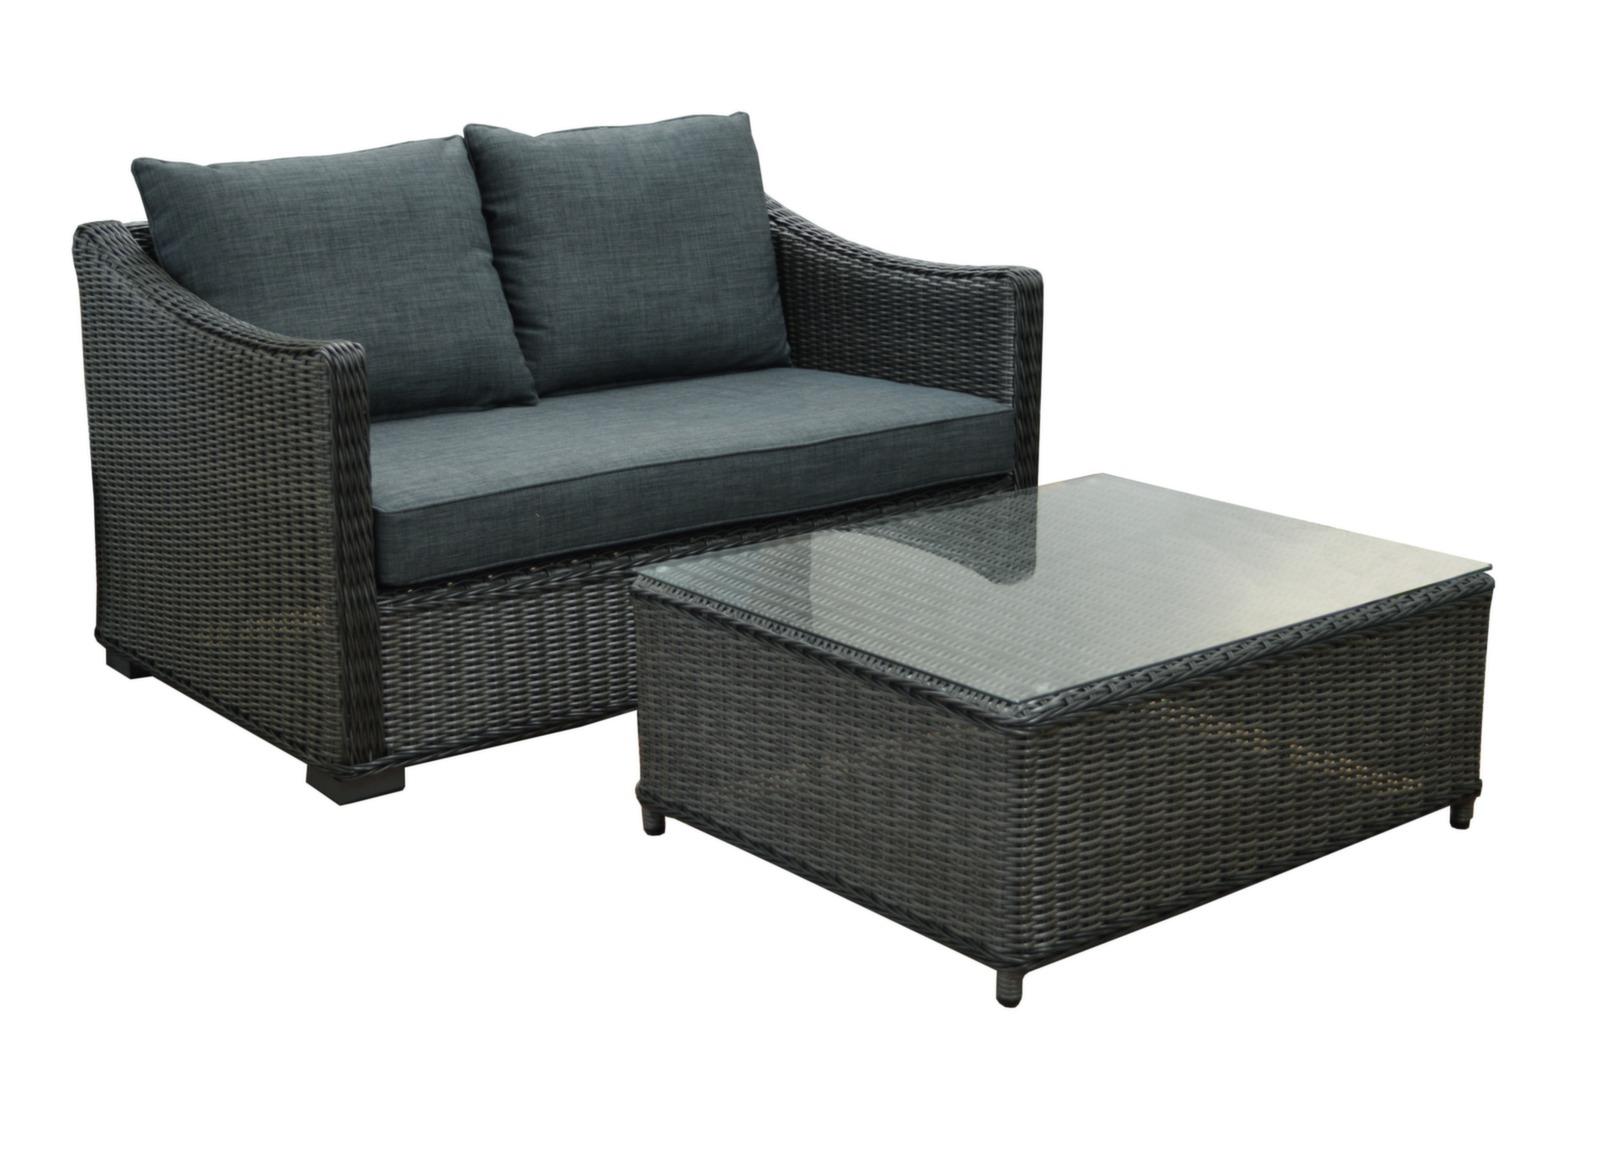 salon de jardin bas en r sine tress e portland proloisirs. Black Bedroom Furniture Sets. Home Design Ideas